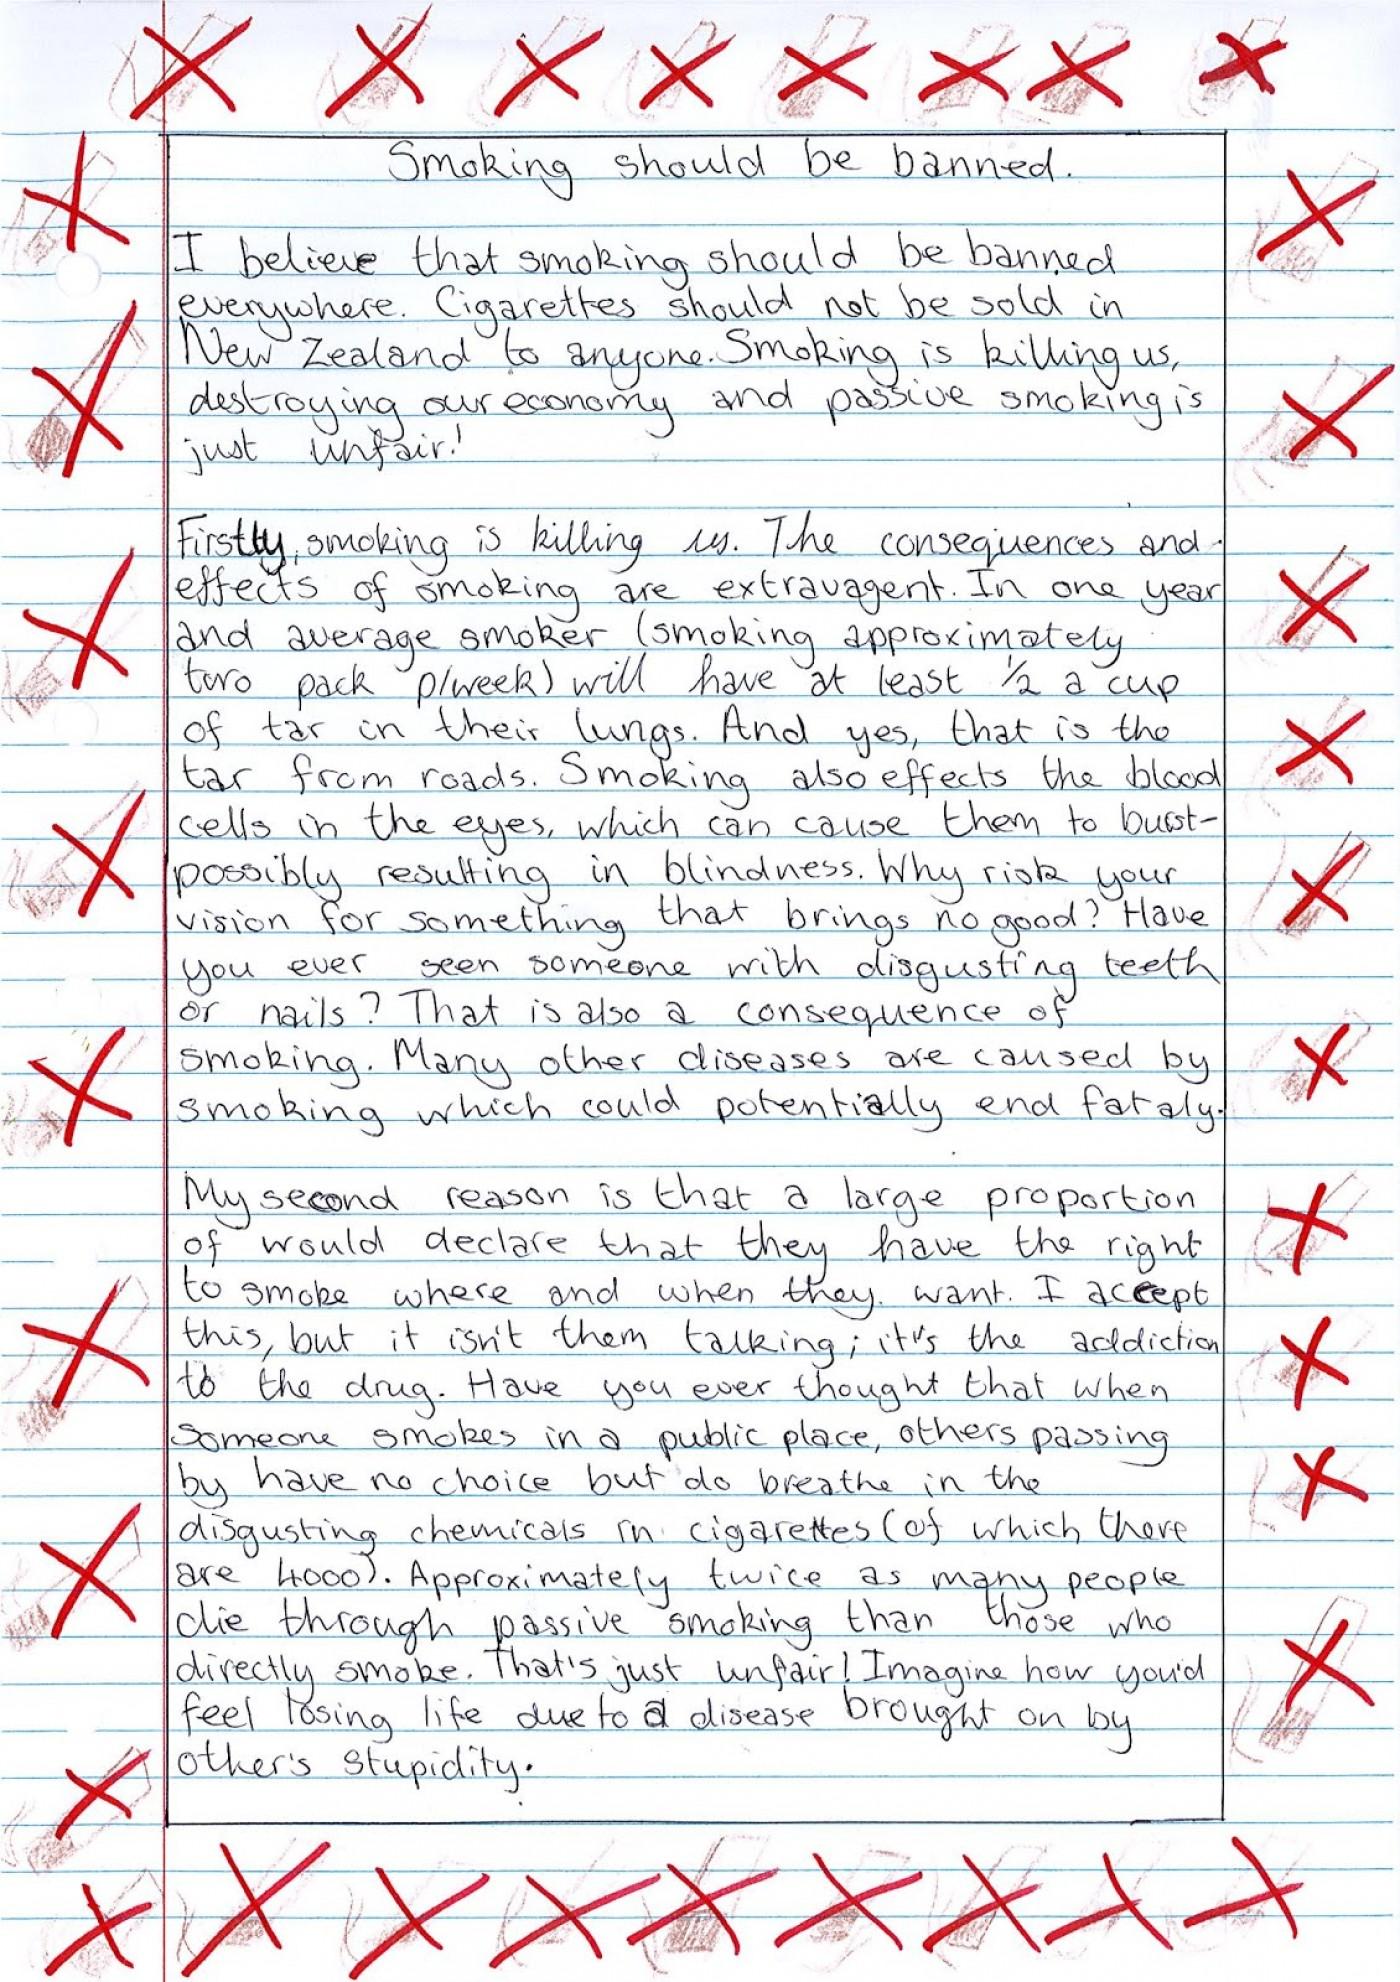 002 Examination Should Abolished Essay Example Smoklng1 Surprising Be Public At School Level Not 1400